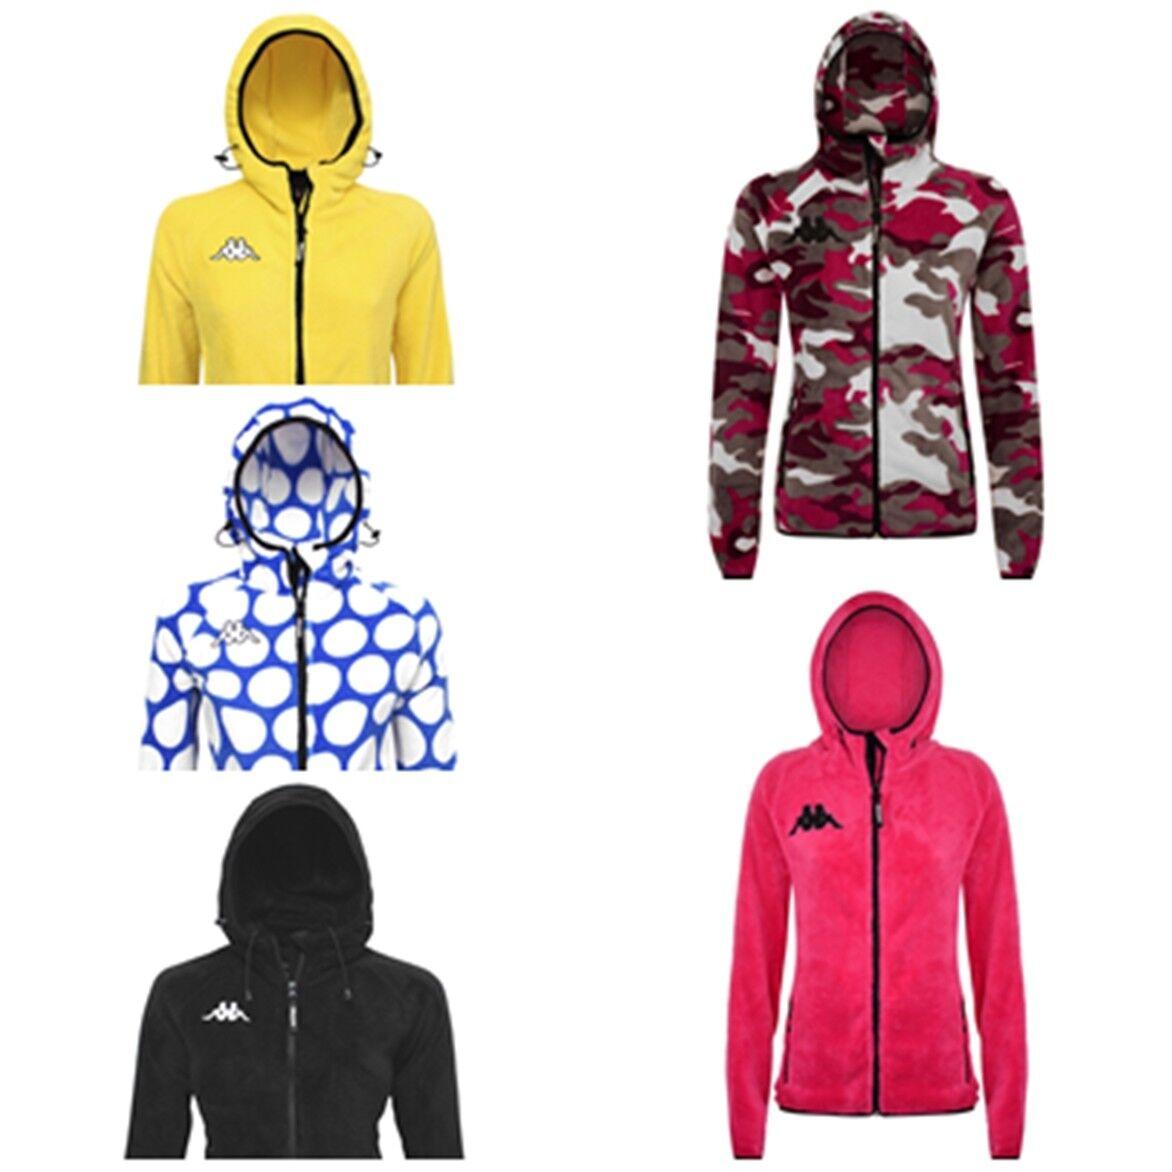 2018-2020 Kappa 6cento 632b Fleece Sherpa Slim Fit Women's Ski Snow Ski 302t8a0